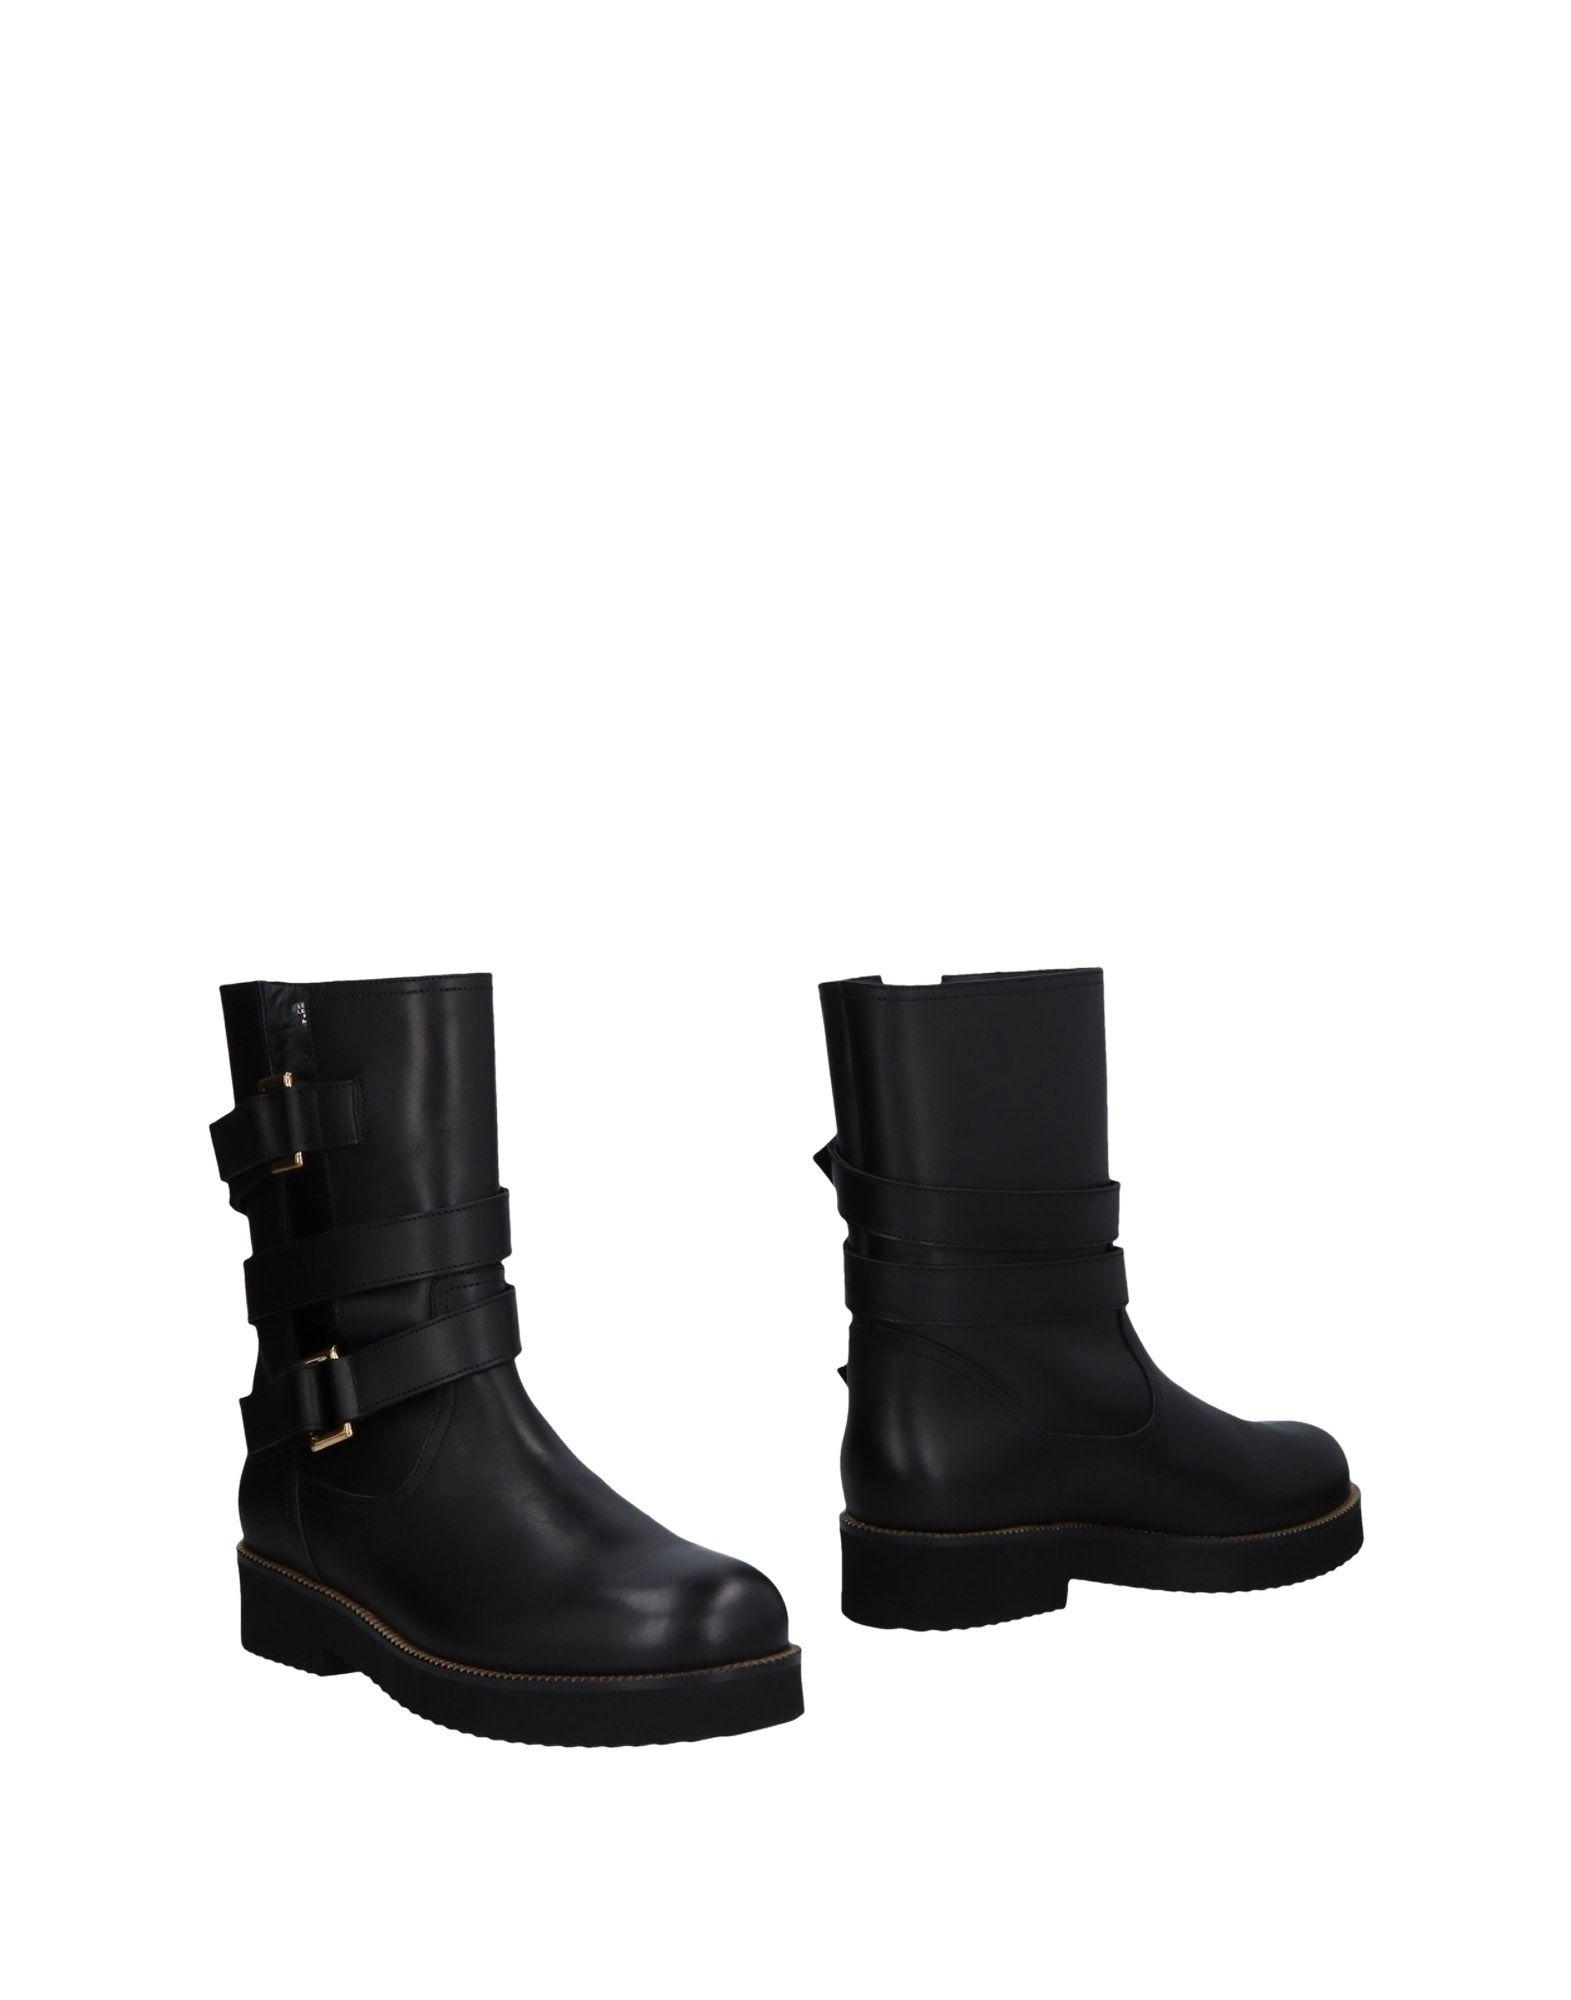 Rabatt Schuhe Stiefelette L' Autre Chose Stiefelette Schuhe Damen  11475854WP 2ee9d5